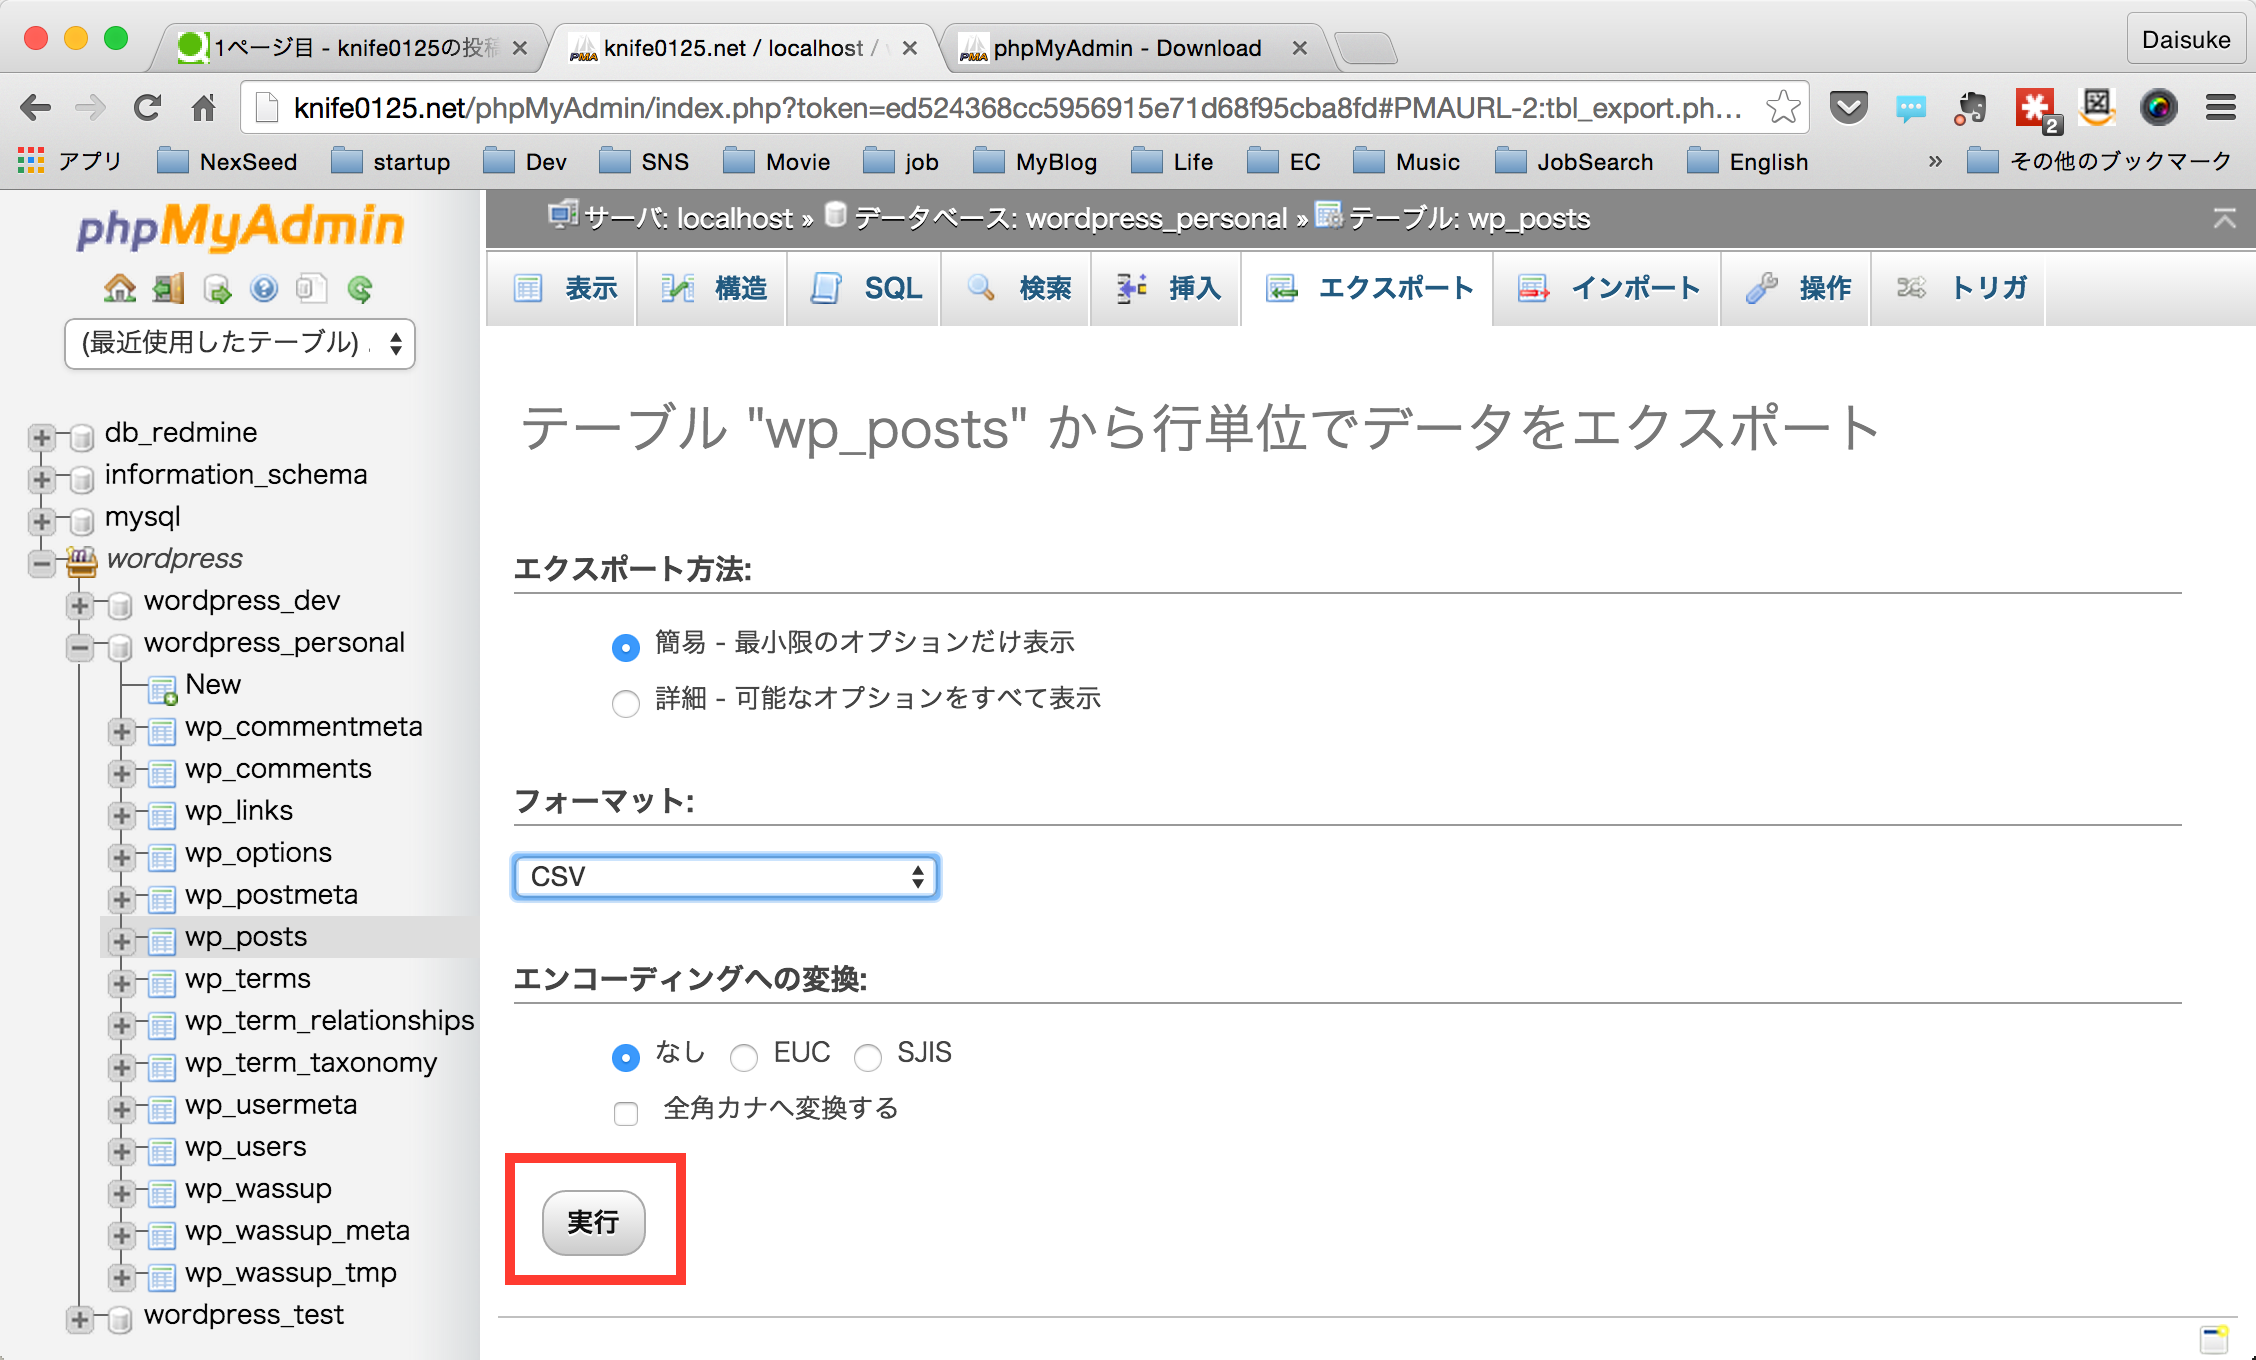 PHPMyAdmin_Export_07.png